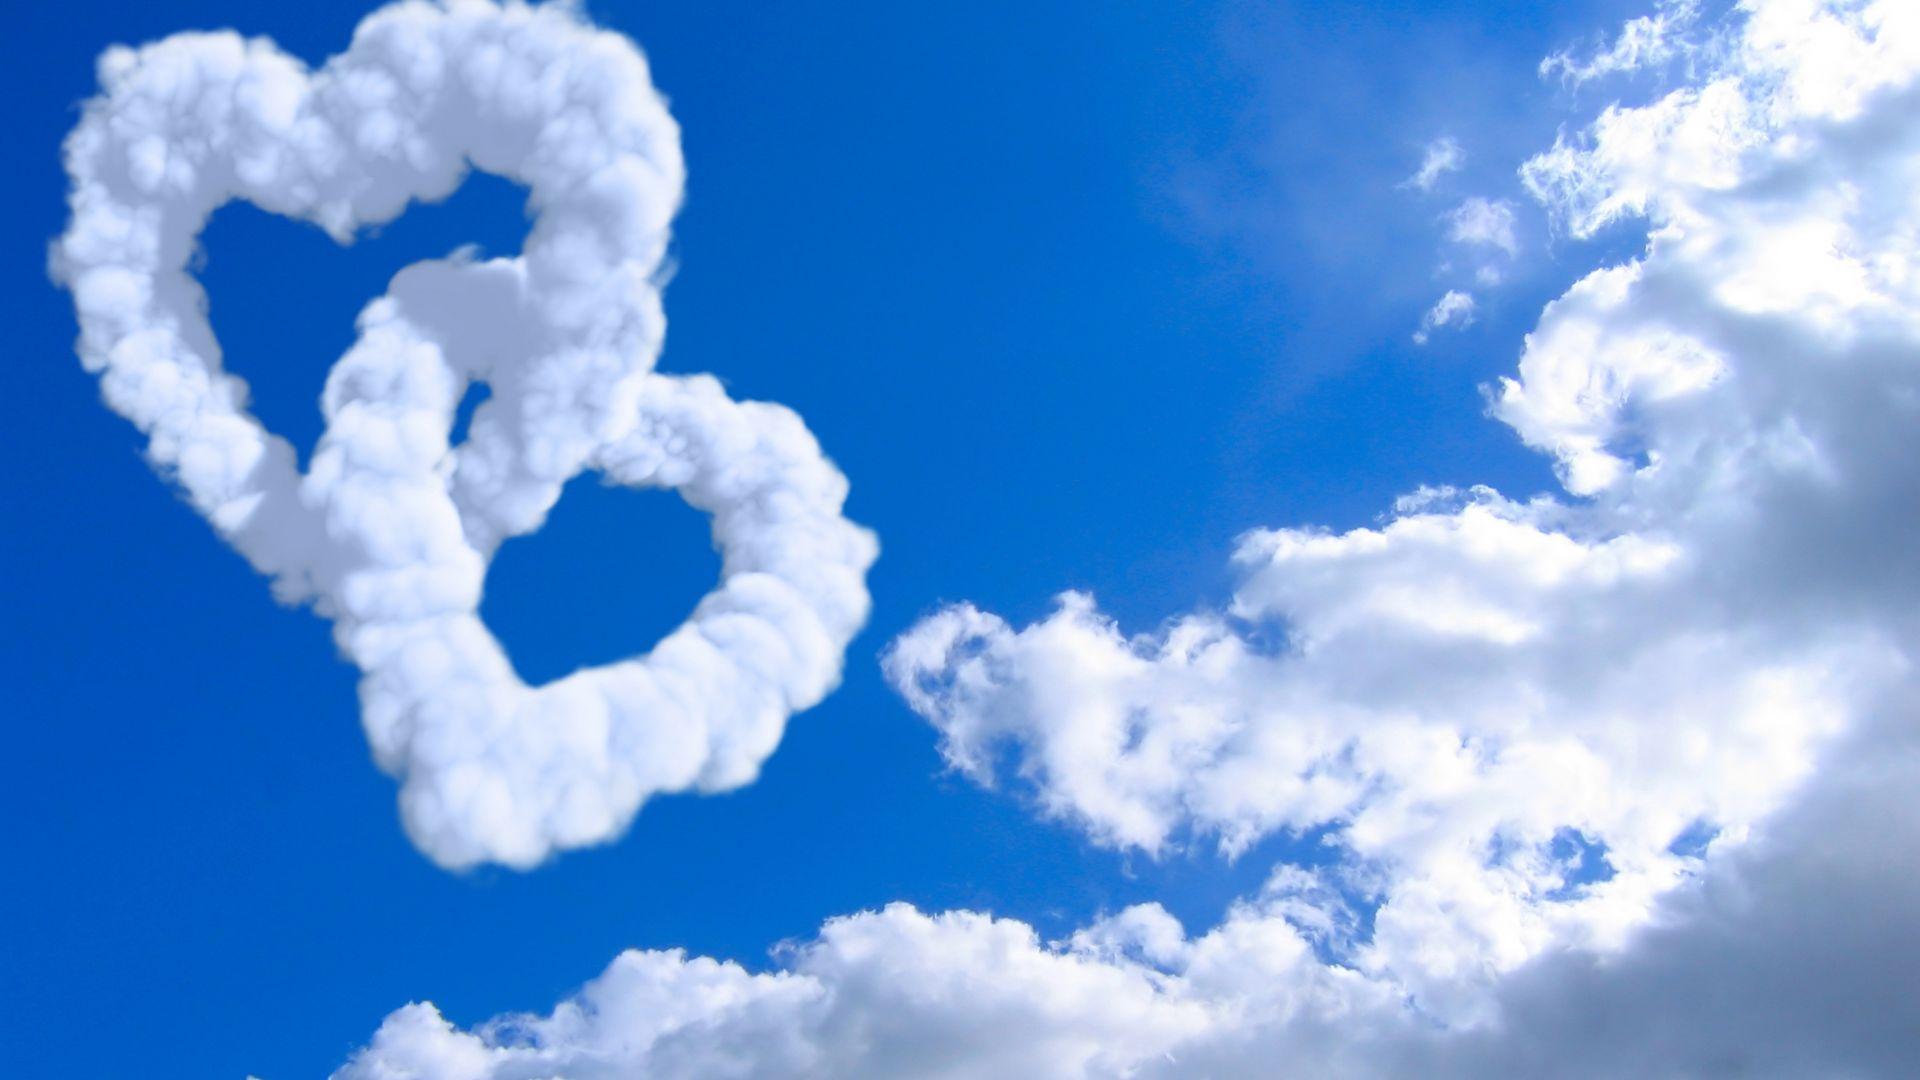 wallpaper heart, 5k, 4k wallpaper, 8k, cloud, blue sky, nature #9969